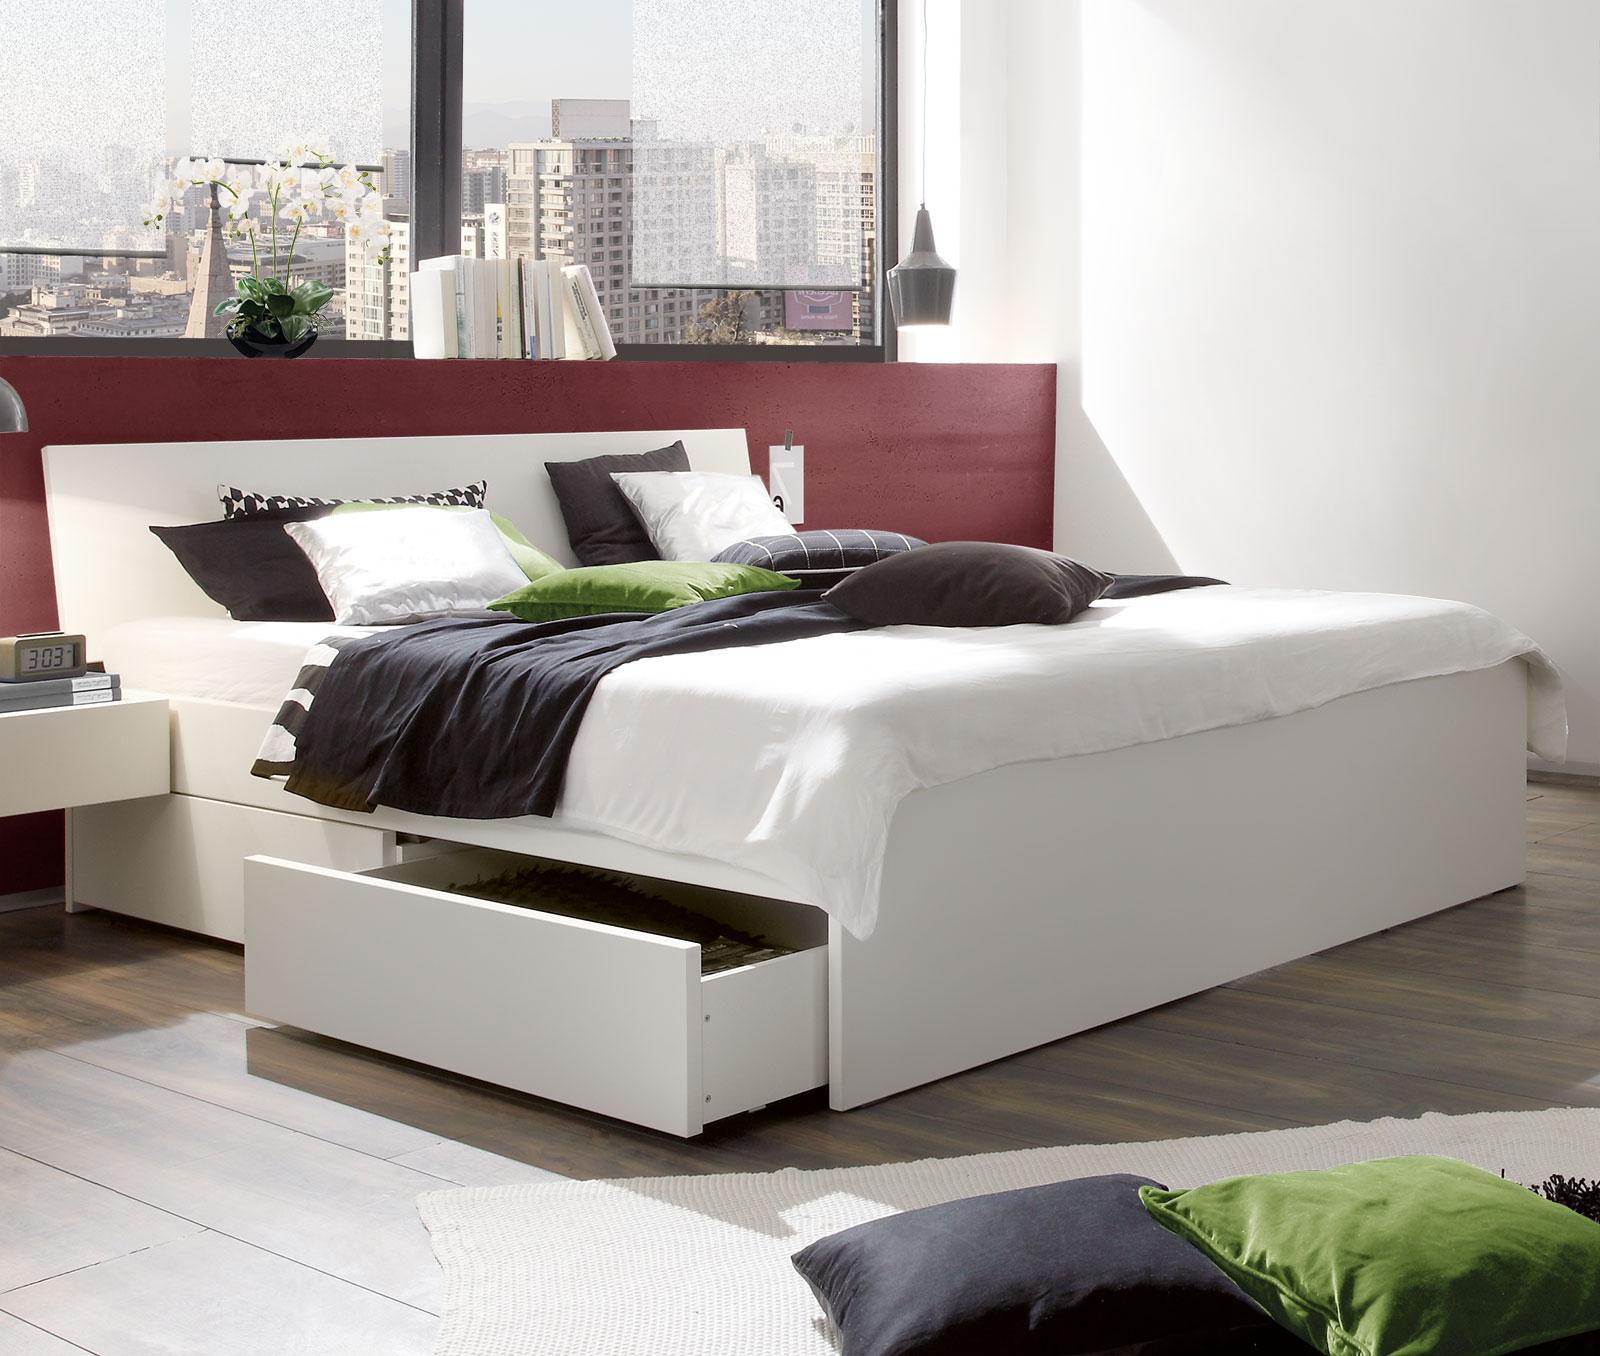 Full Size of Weies Schubkasten Bett In Bergren Erhltlich Liverpool Bett Www.betten.de